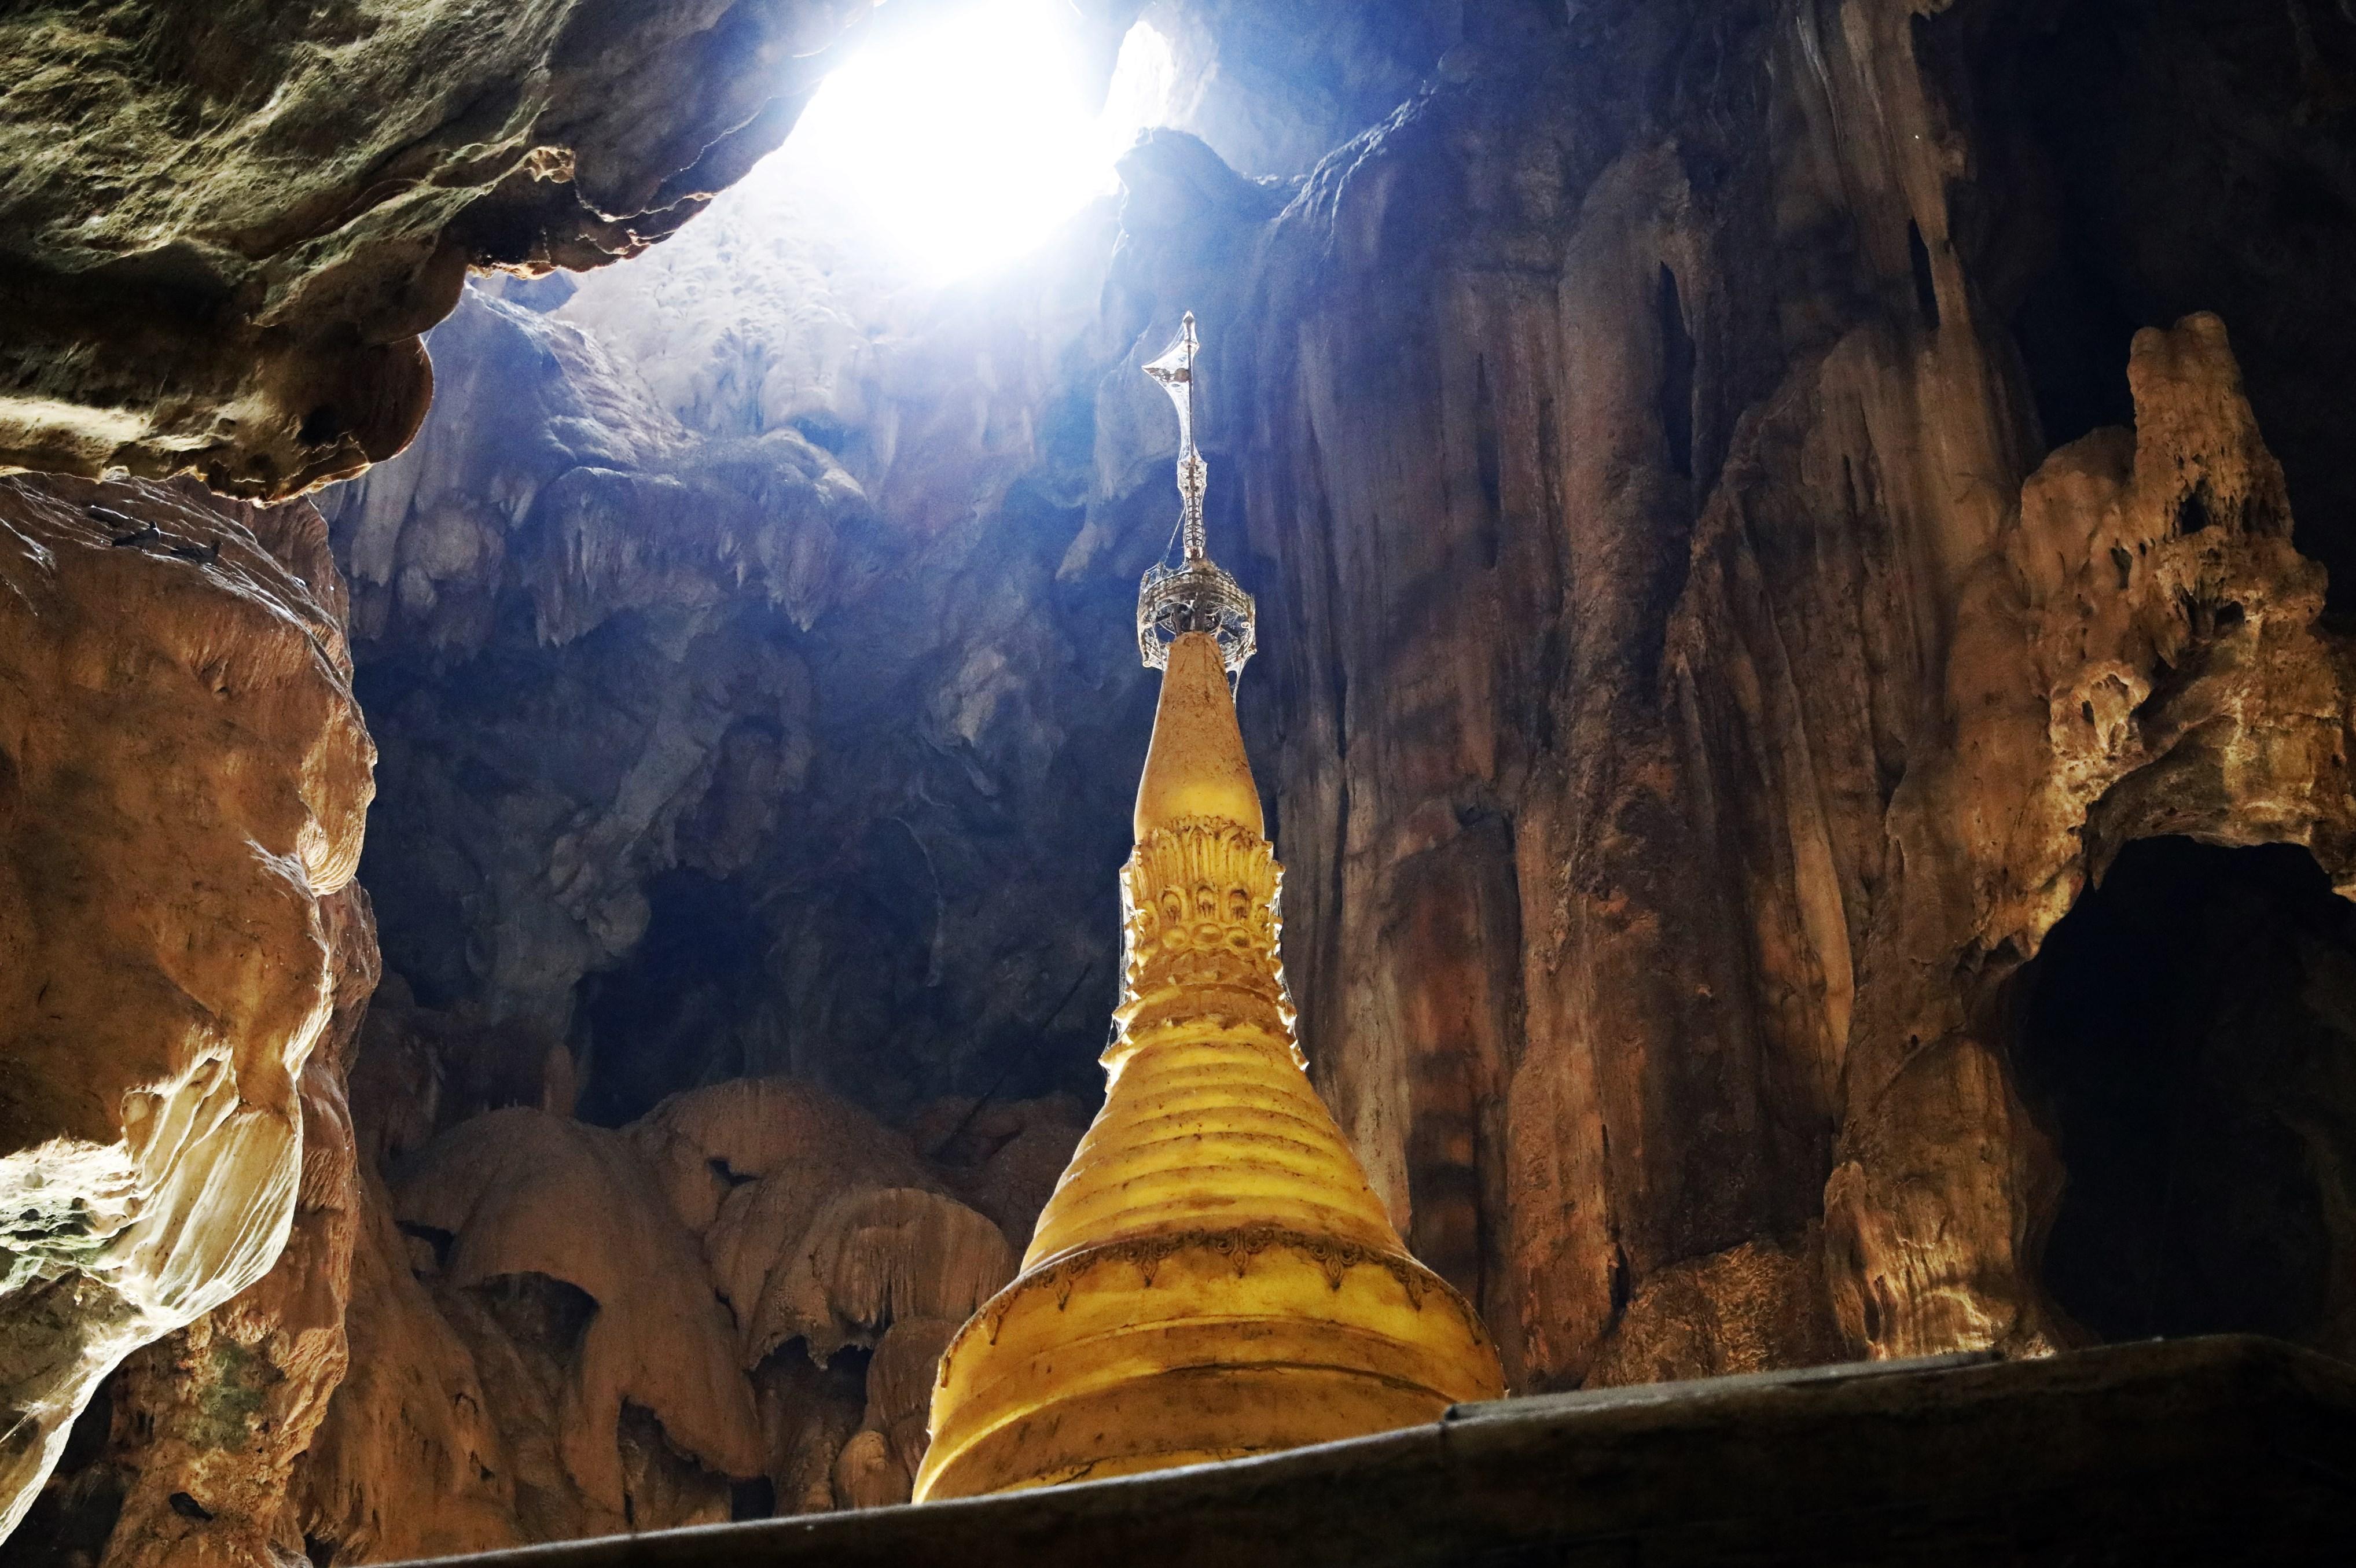 Yathae Pyan Cave